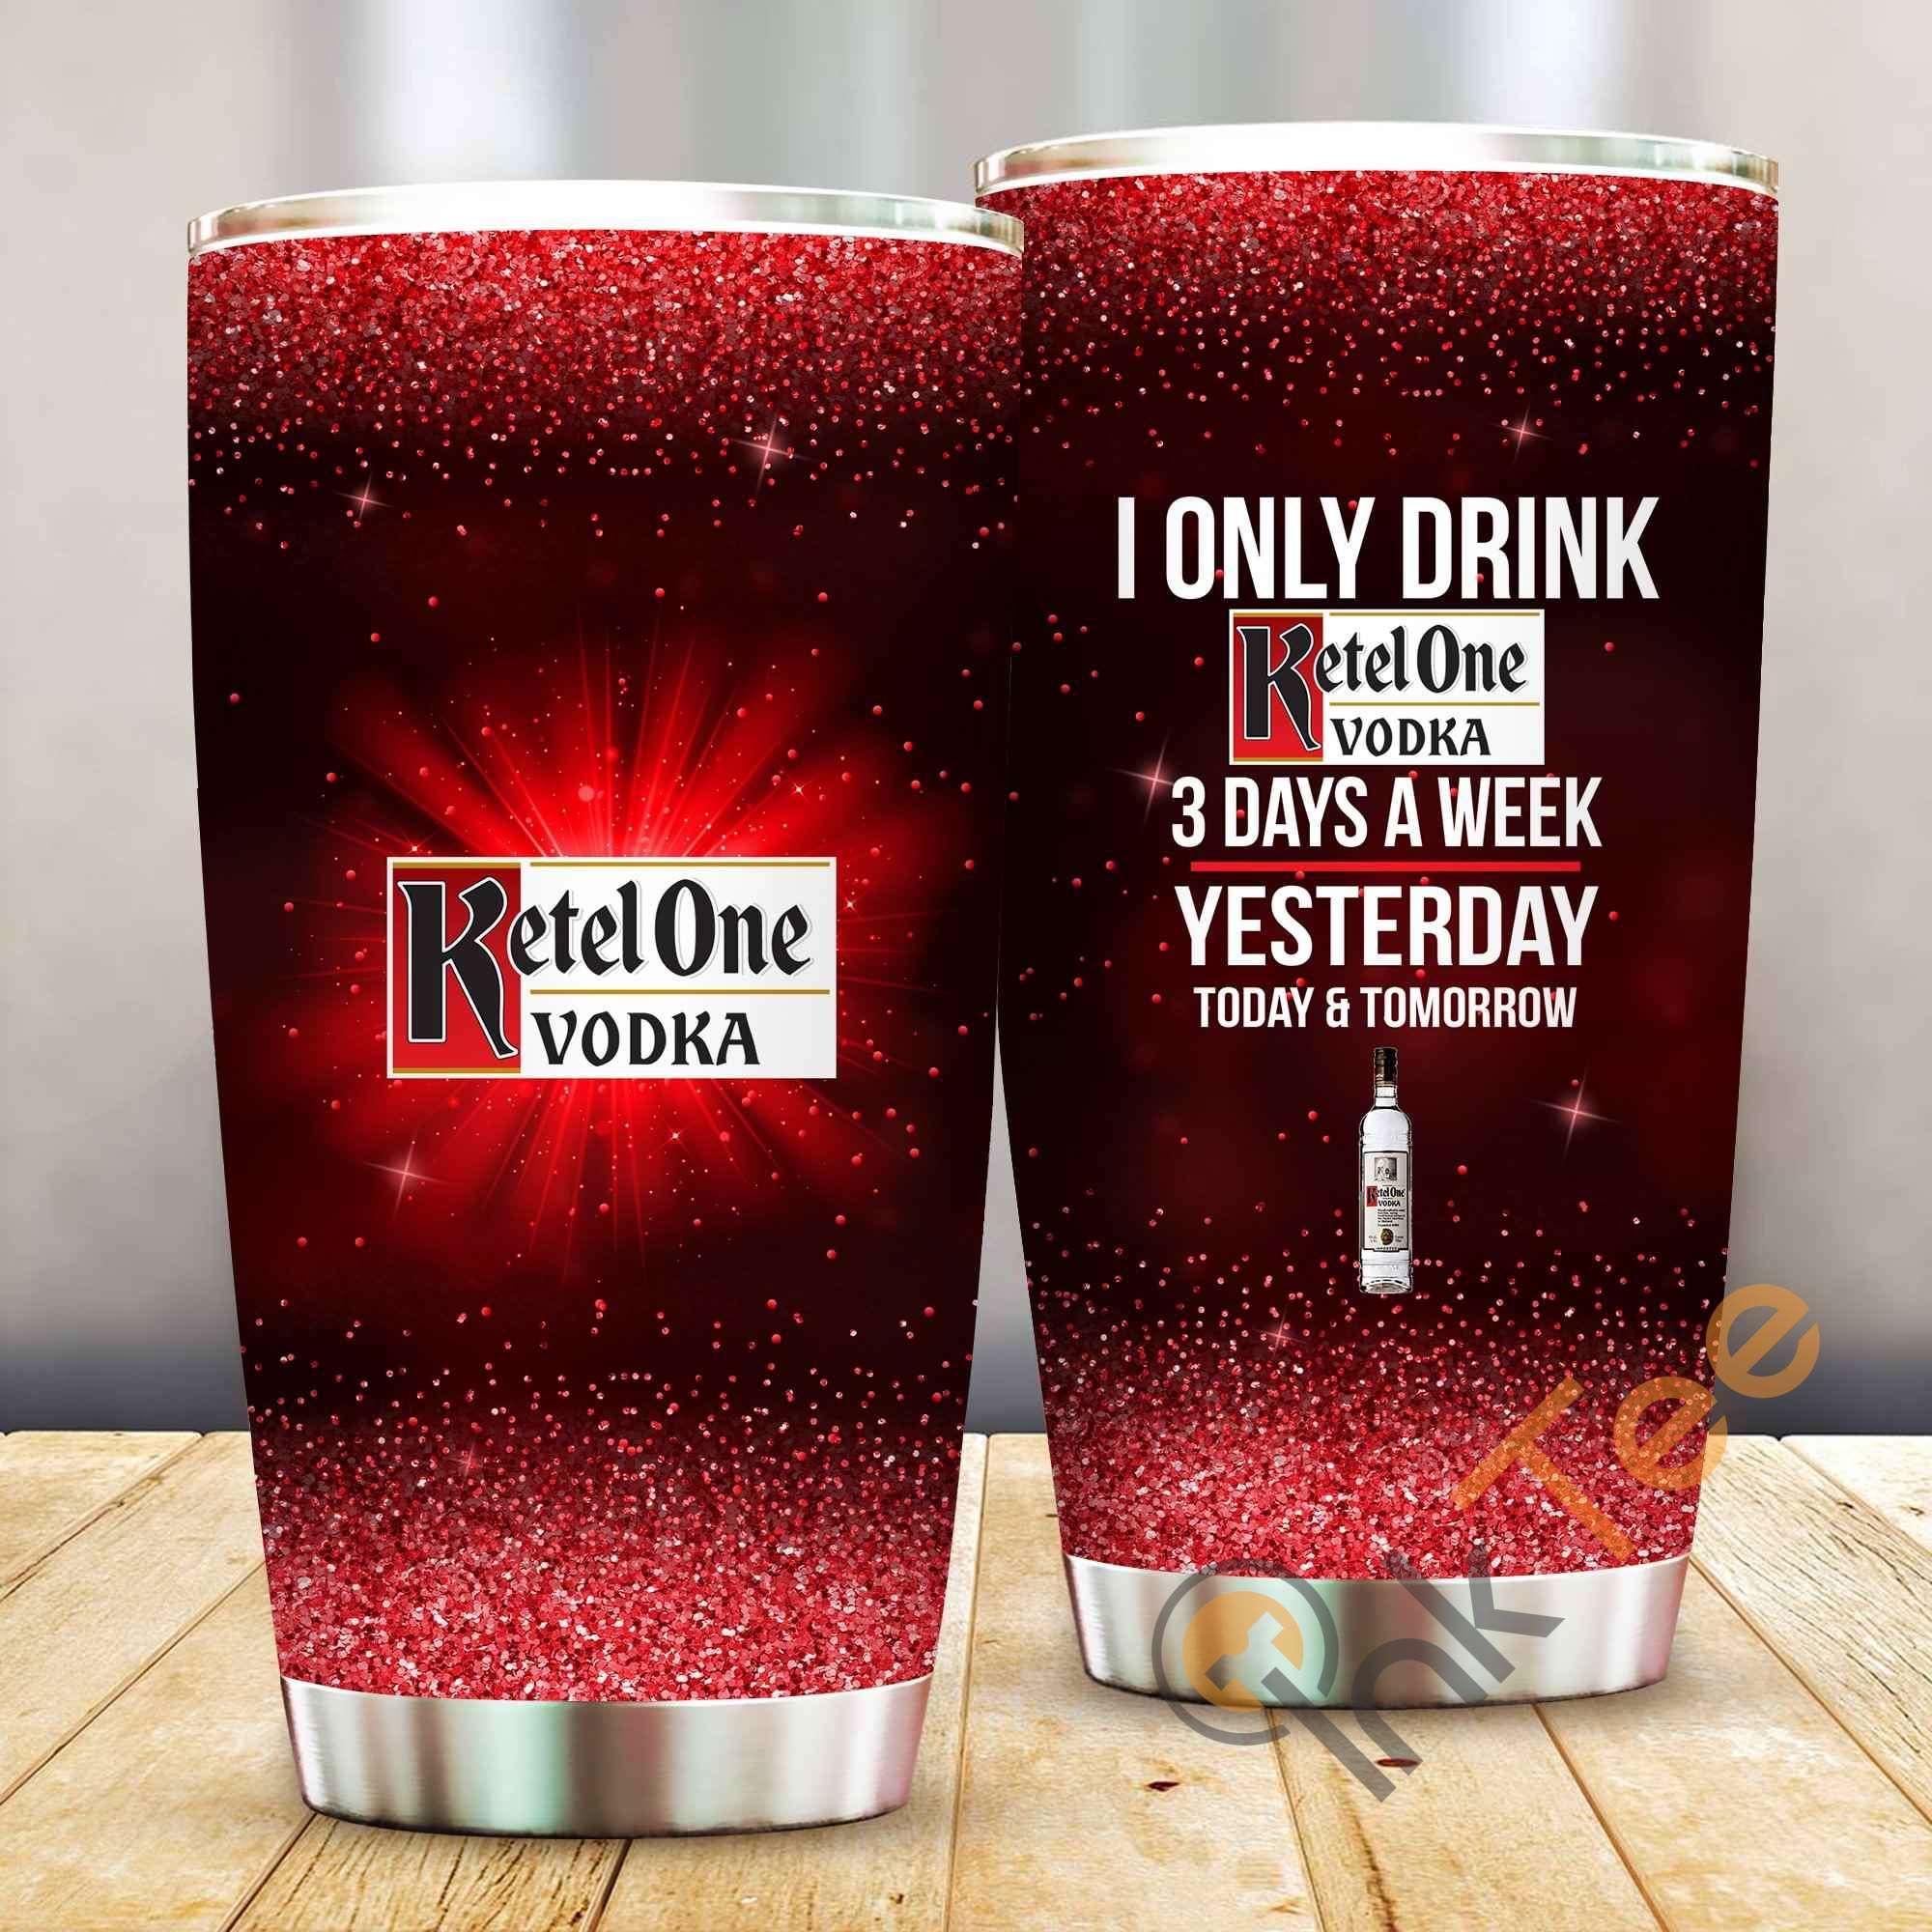 I Only Drink Ketel One Vodka 3 Days A Week Amazon Best Seller Sku 3981 Stainless Steel Tumbler